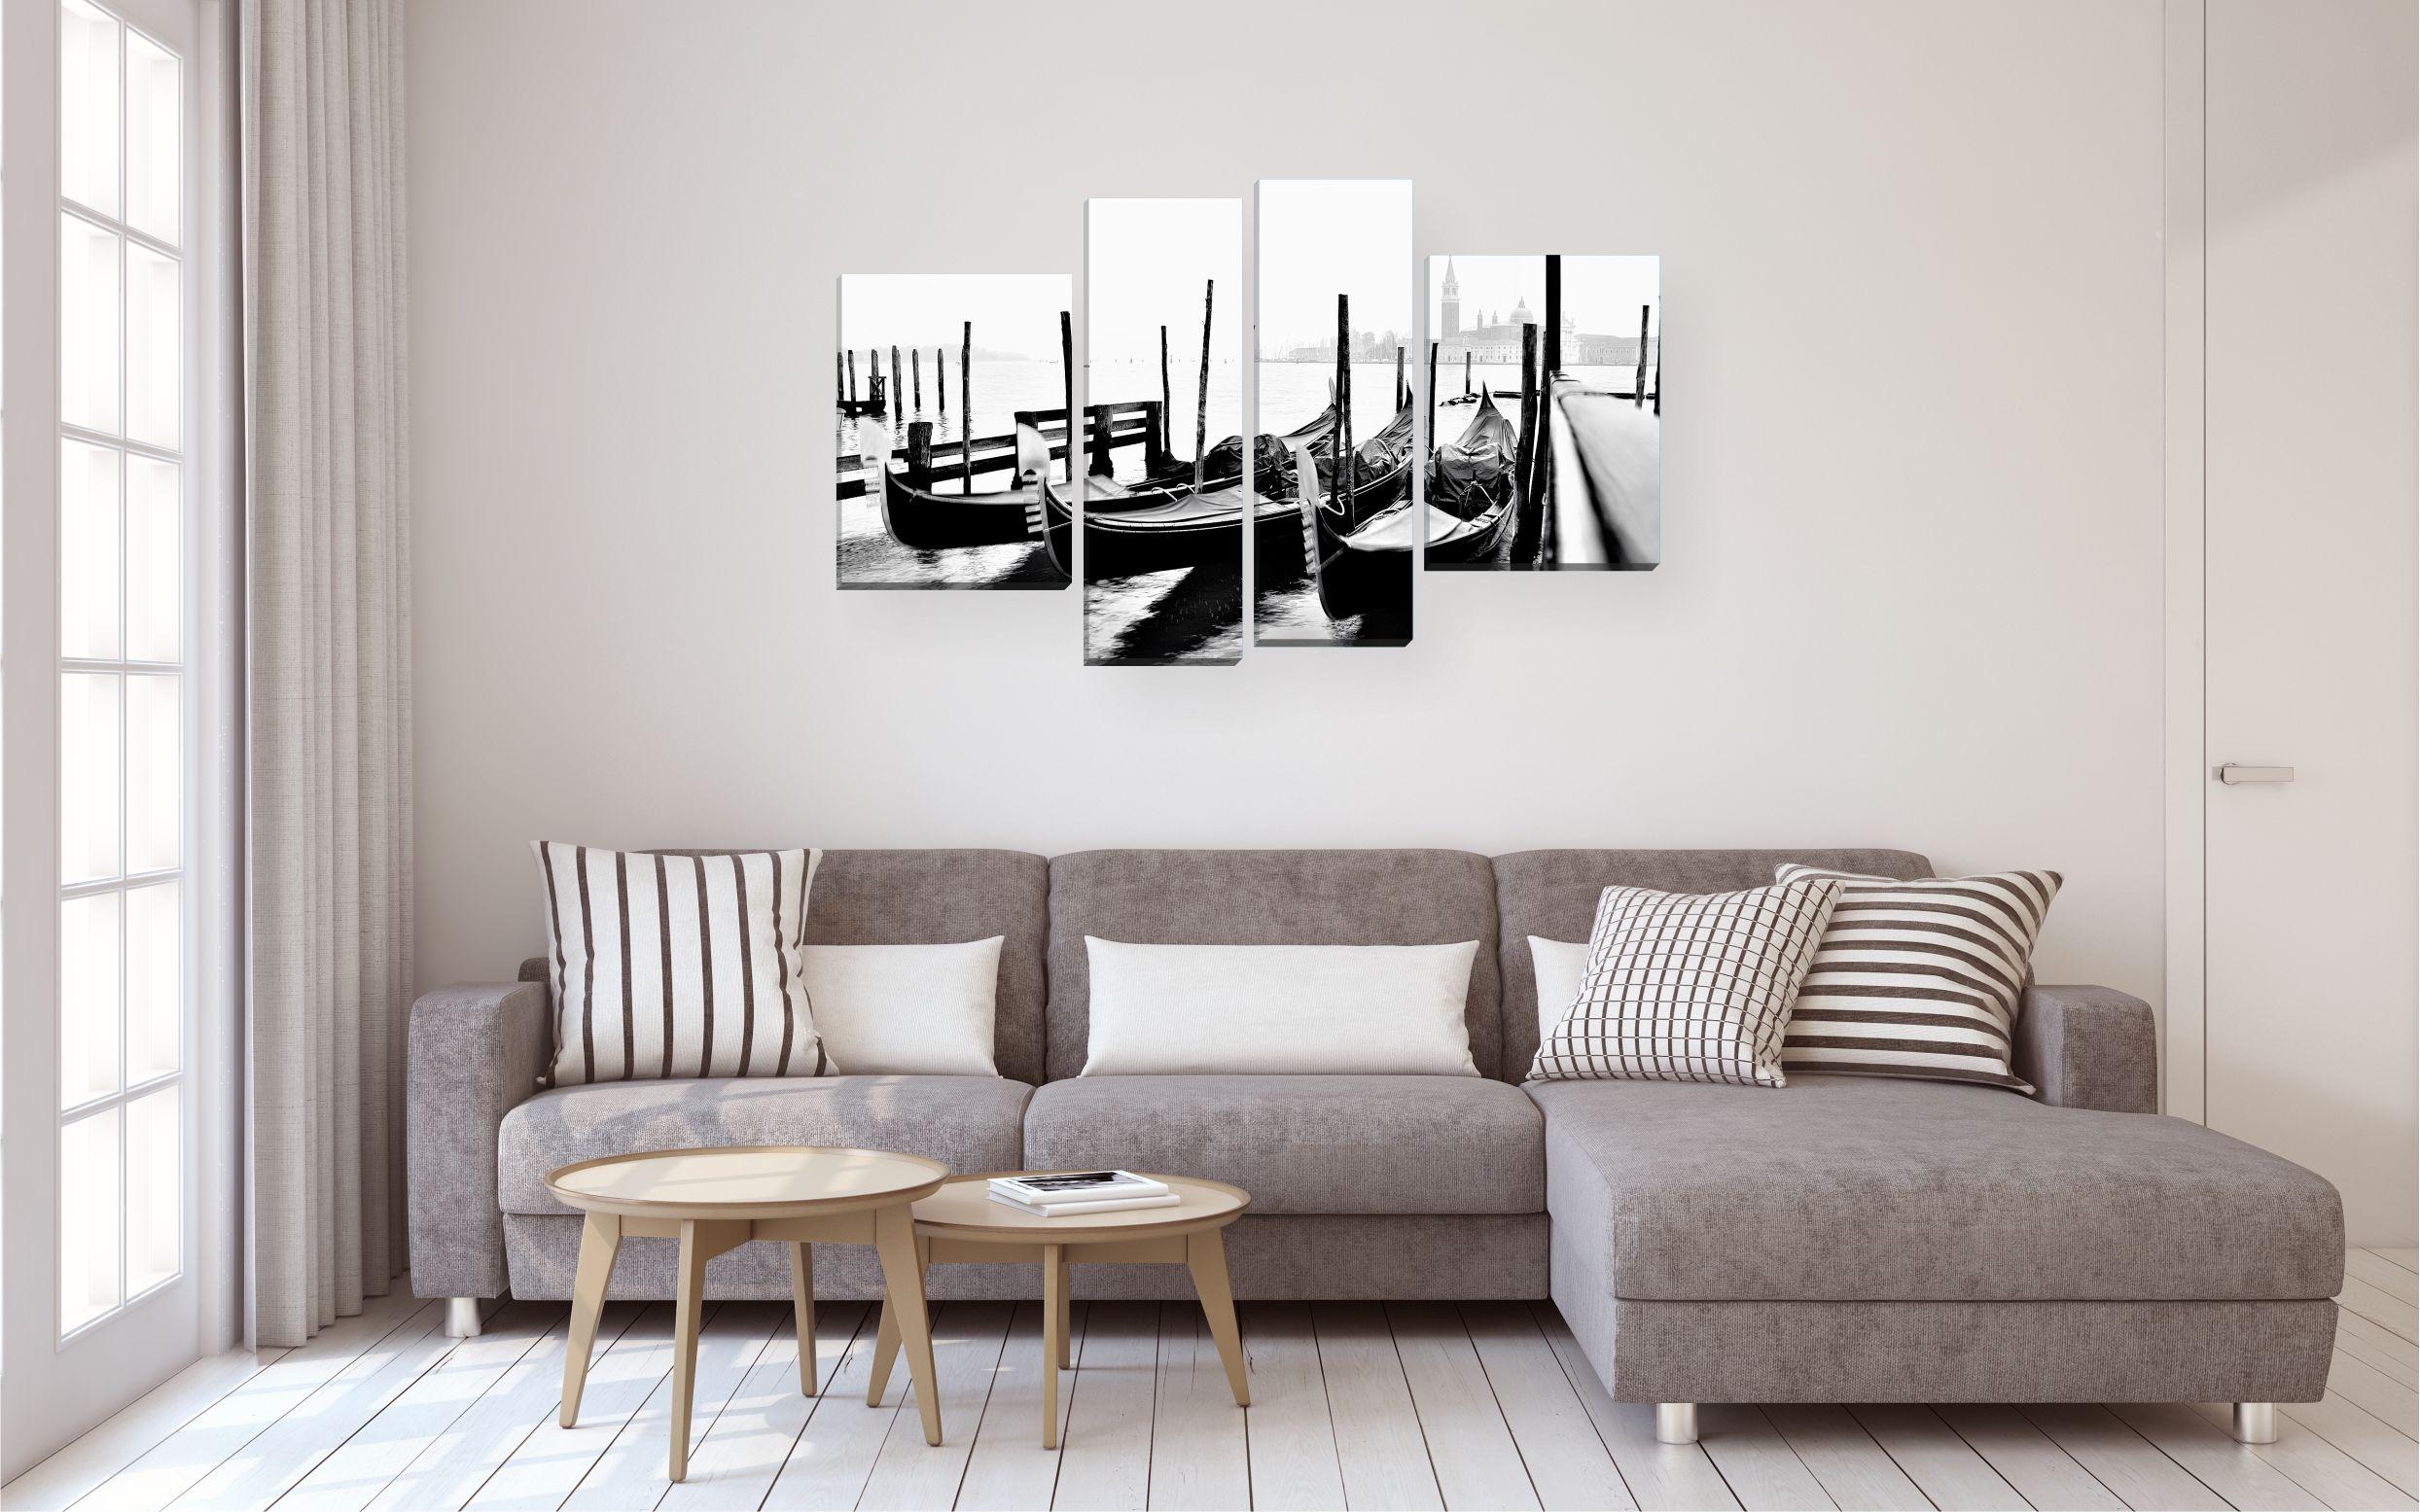 modulnaja kartina cherno belye foto lodki v interere gostinoj - Черно-белые картины или постеры для декора интерьера